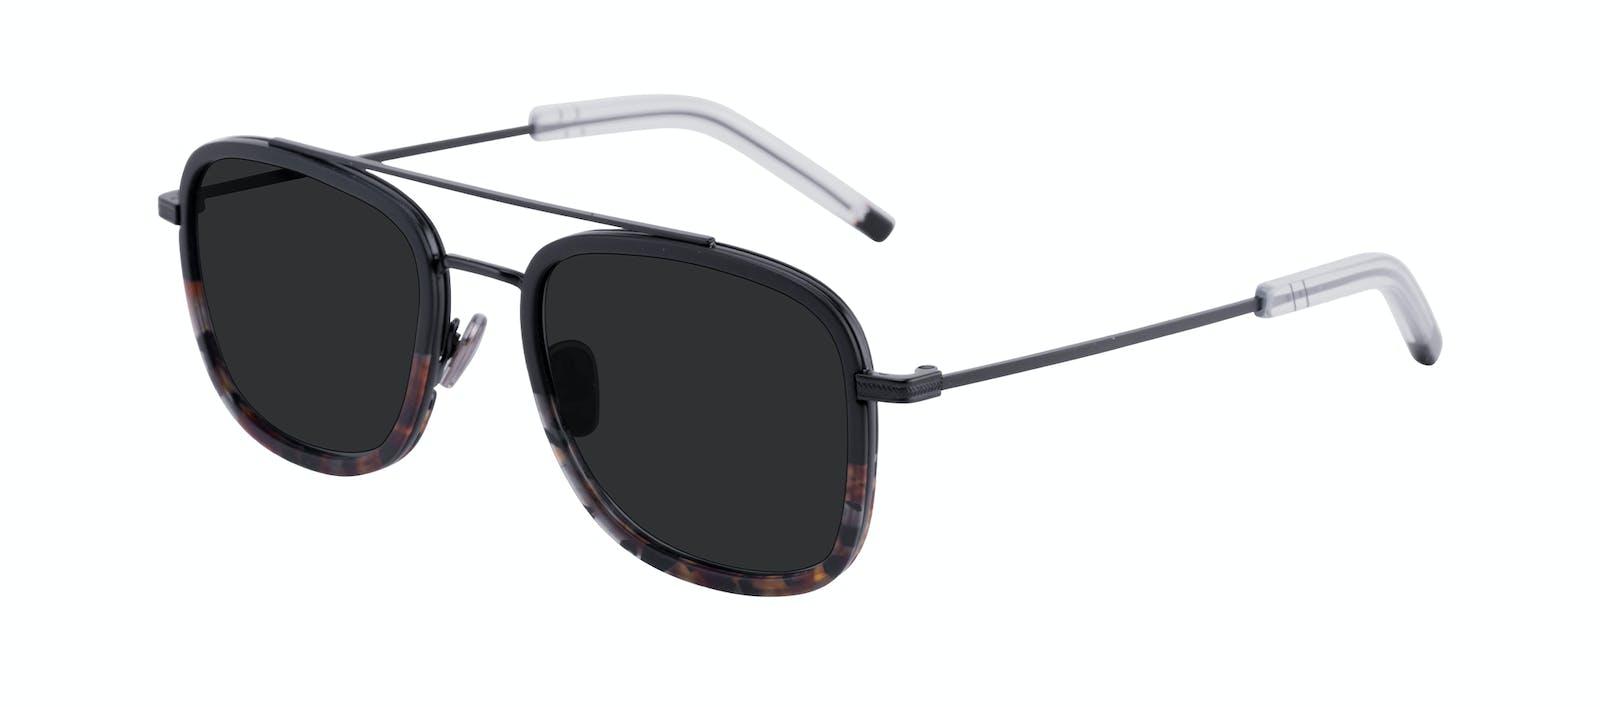 437779300e6 Affordable Fashion Glasses Aviator Rectangle Sunglasses Men Class Mahogany  Tilt